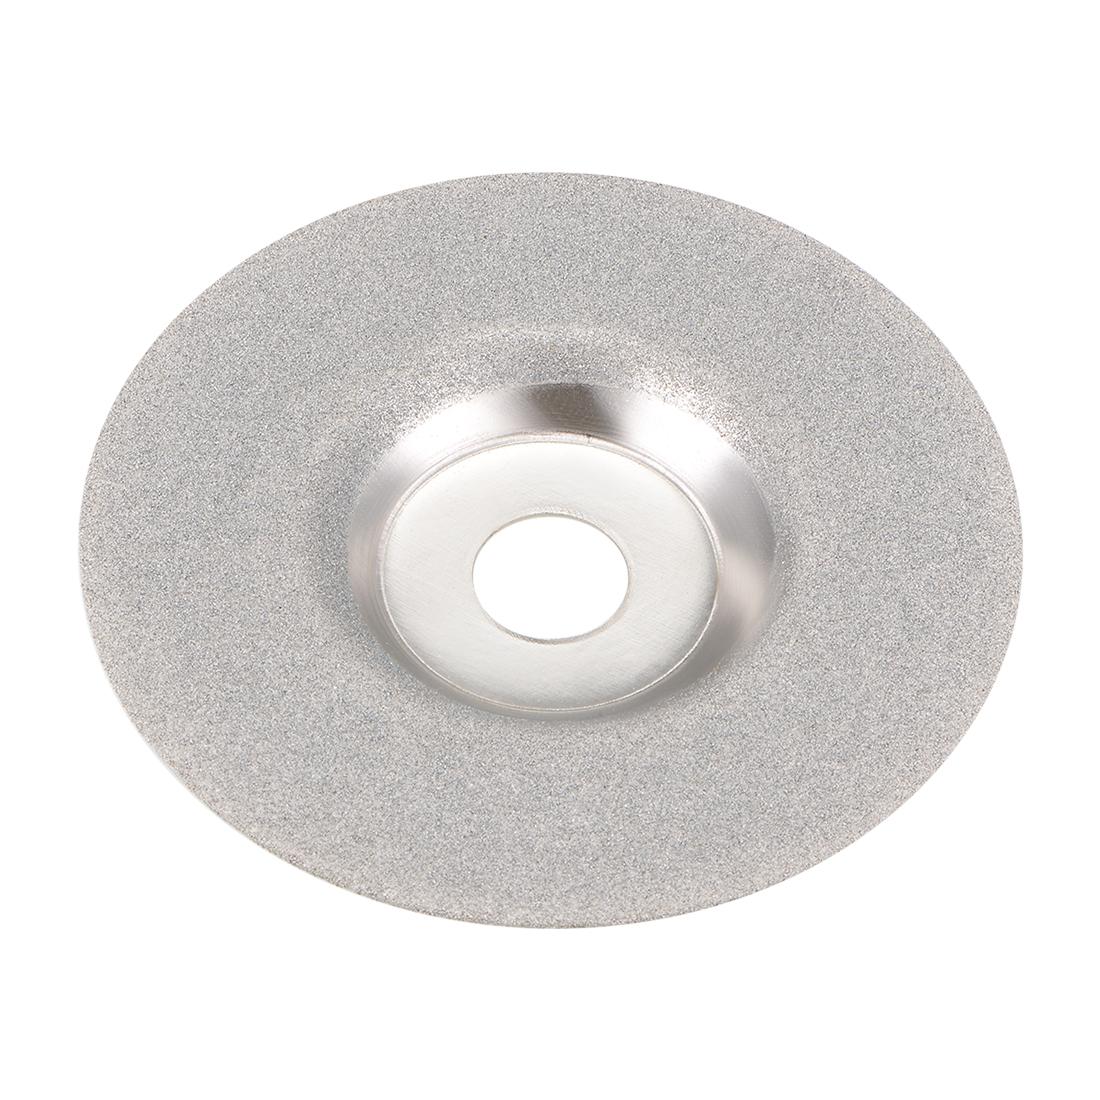 "Diamond Grinding Disc, 4"" Glass Marble Grind Wheel Convex"